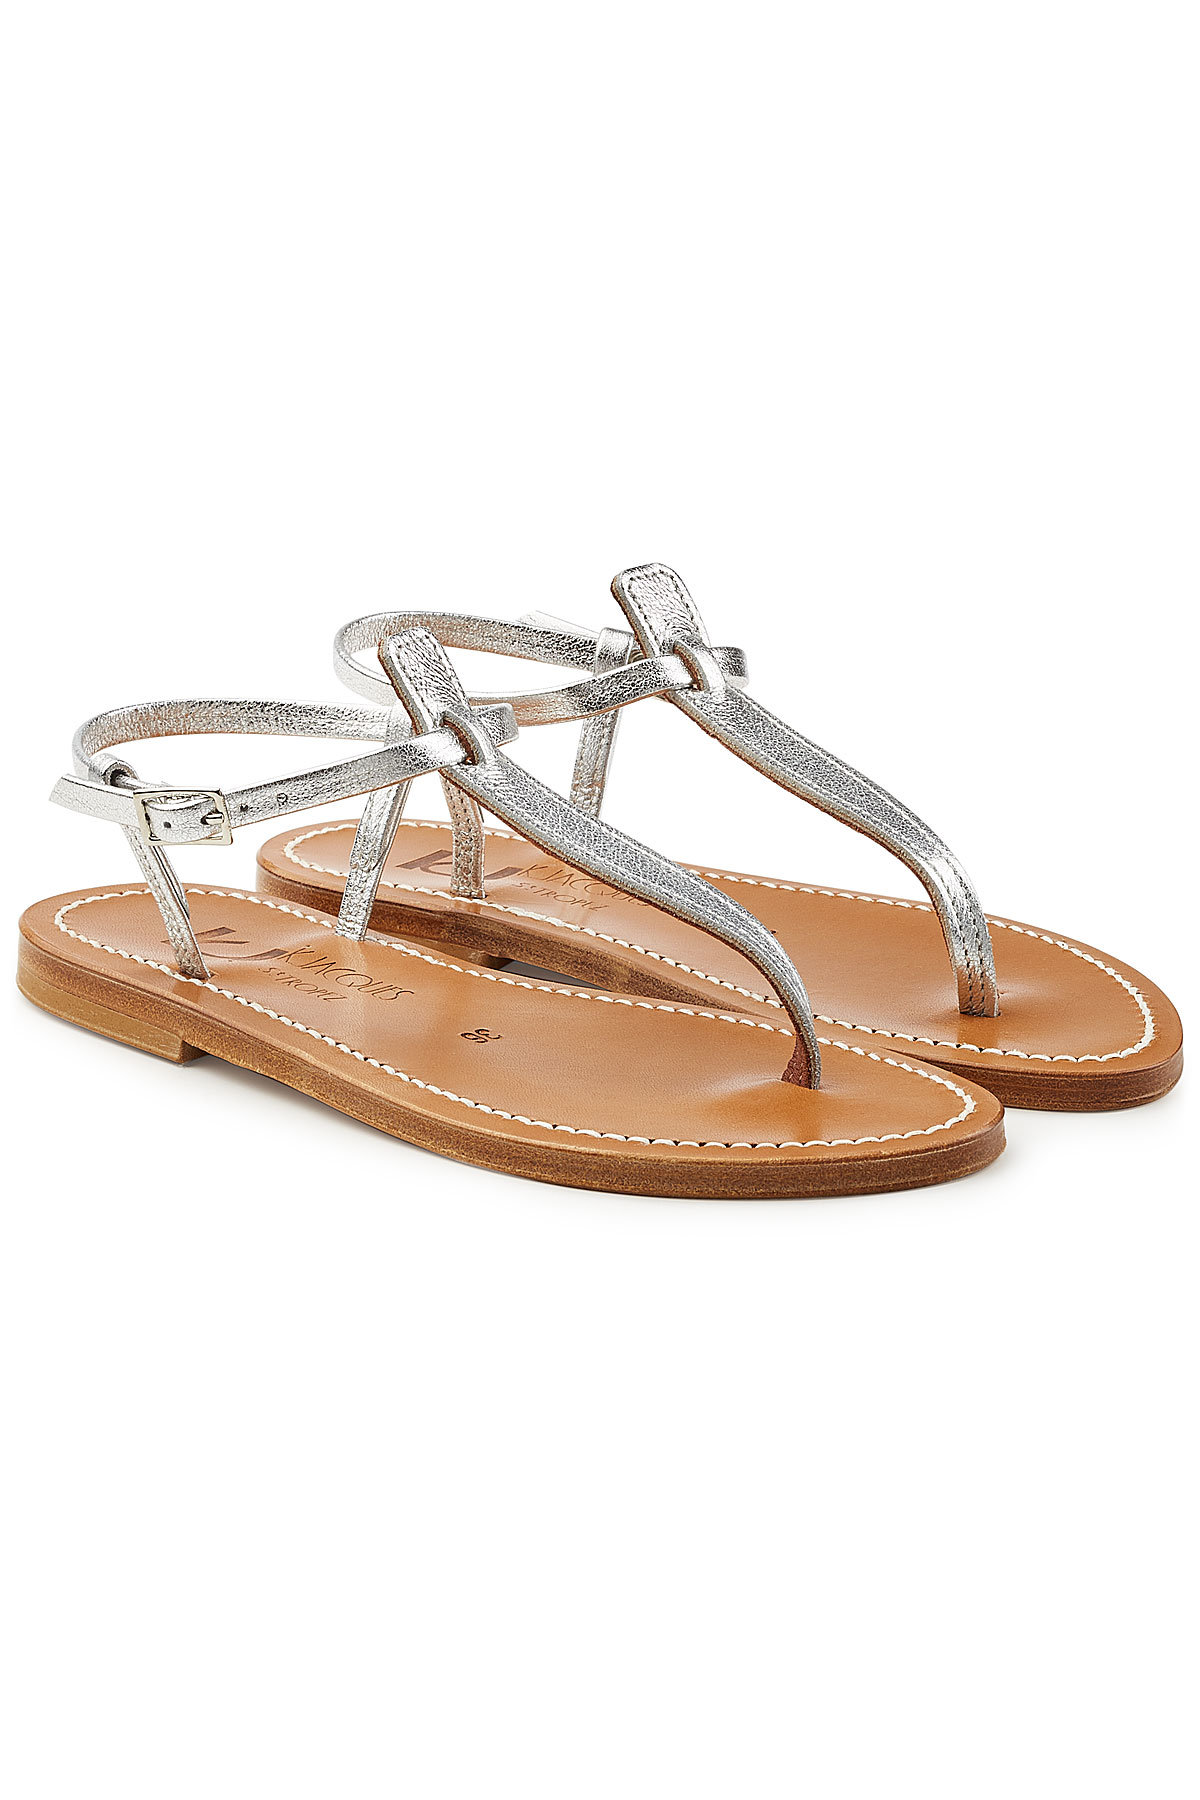 K jacques Picon Metallic Leather Sandals Gr. IT 37 AVGR0u6j5a